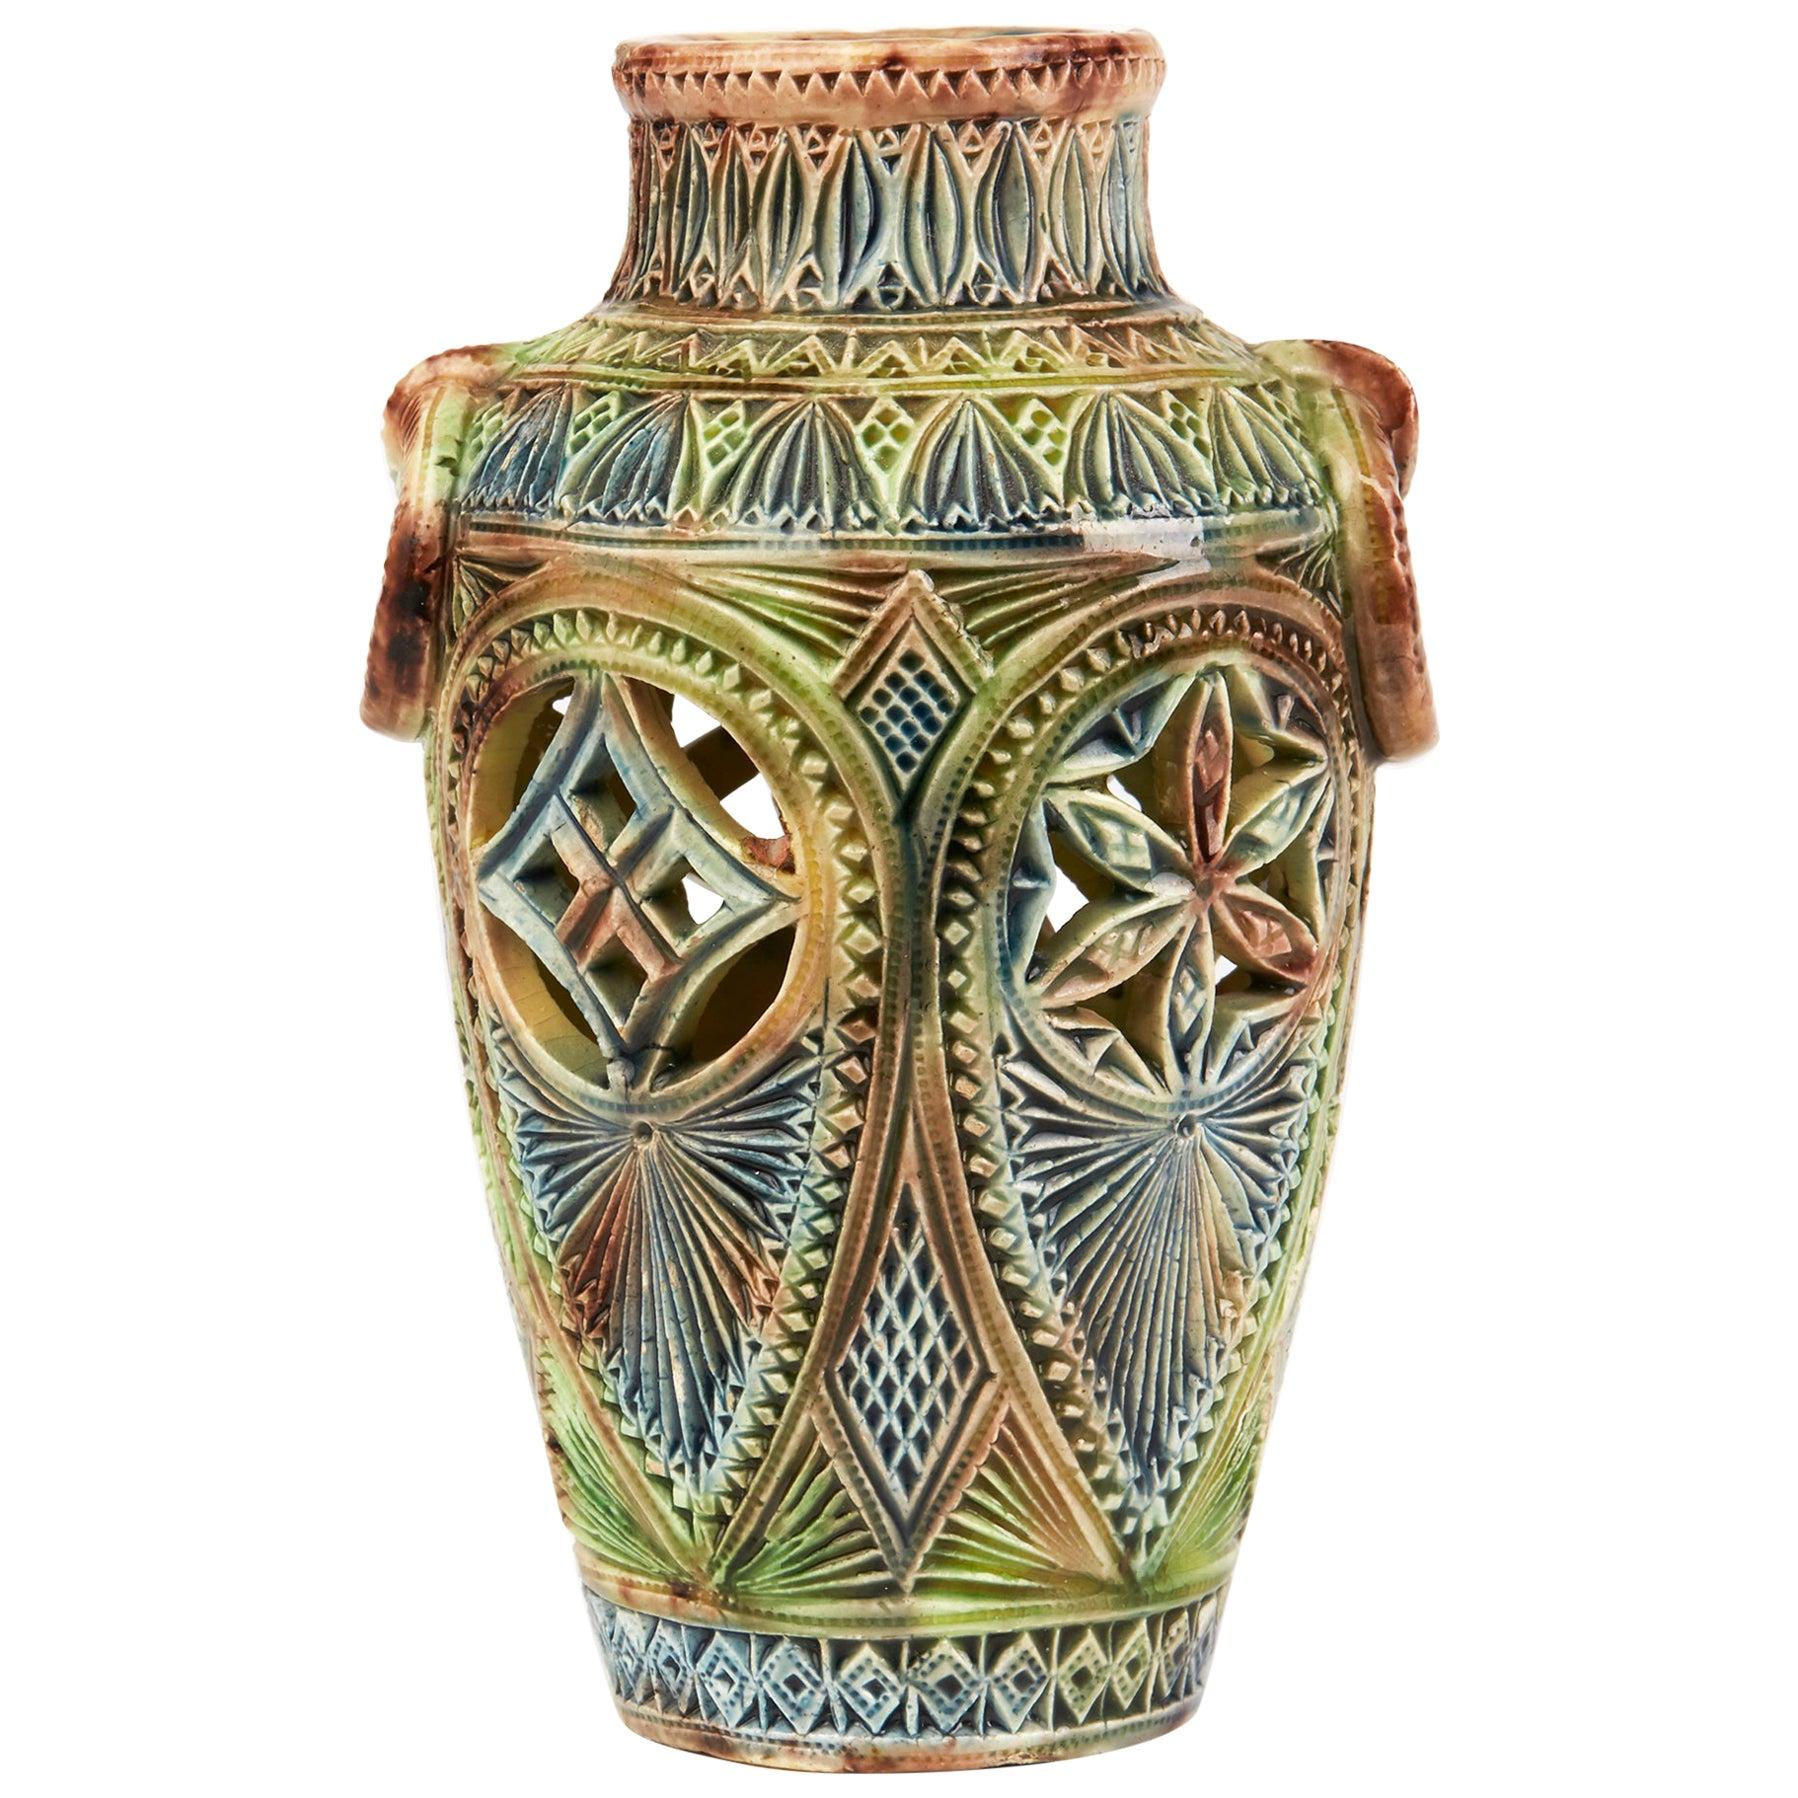 Dutch Frisian Art Pottery Twin Handled Vase, circa 1900